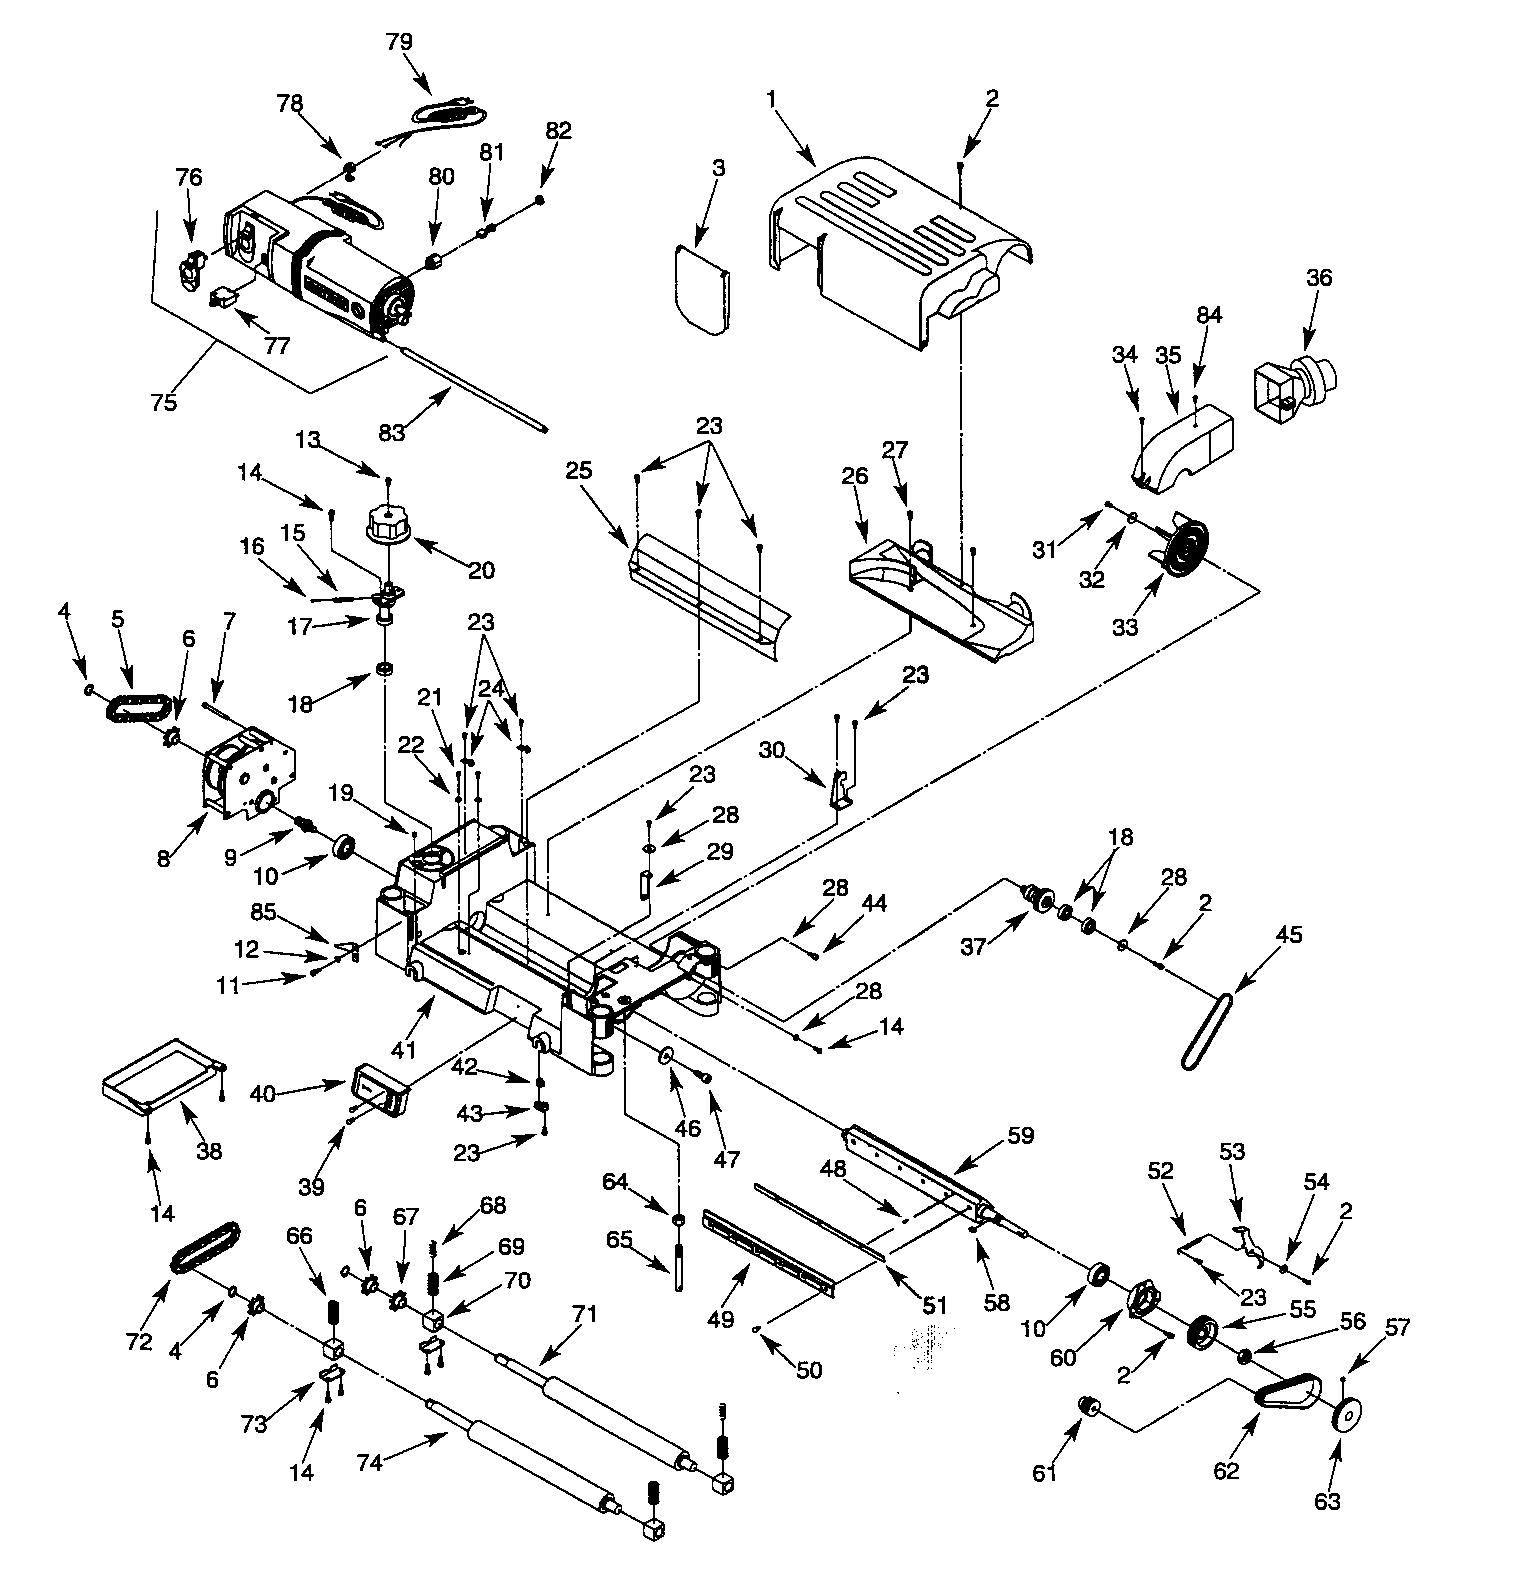 Craftsman model 351217590 planer genuine parts